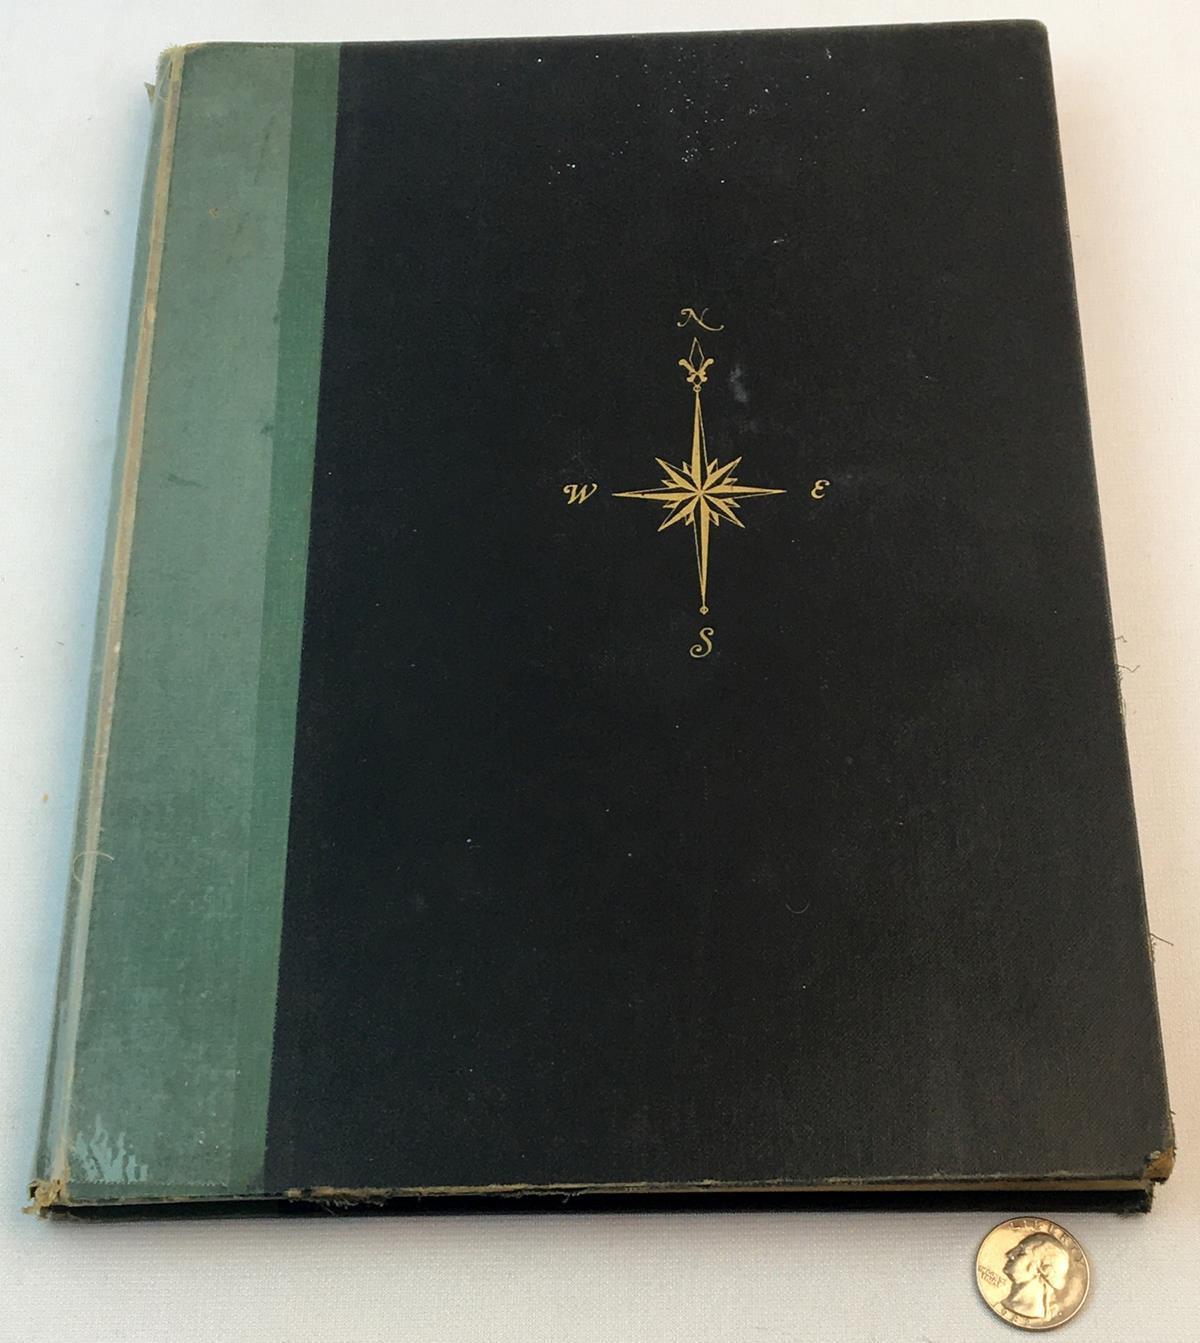 1955 Hammond's New Supreme World Atlas FIRST EDITION